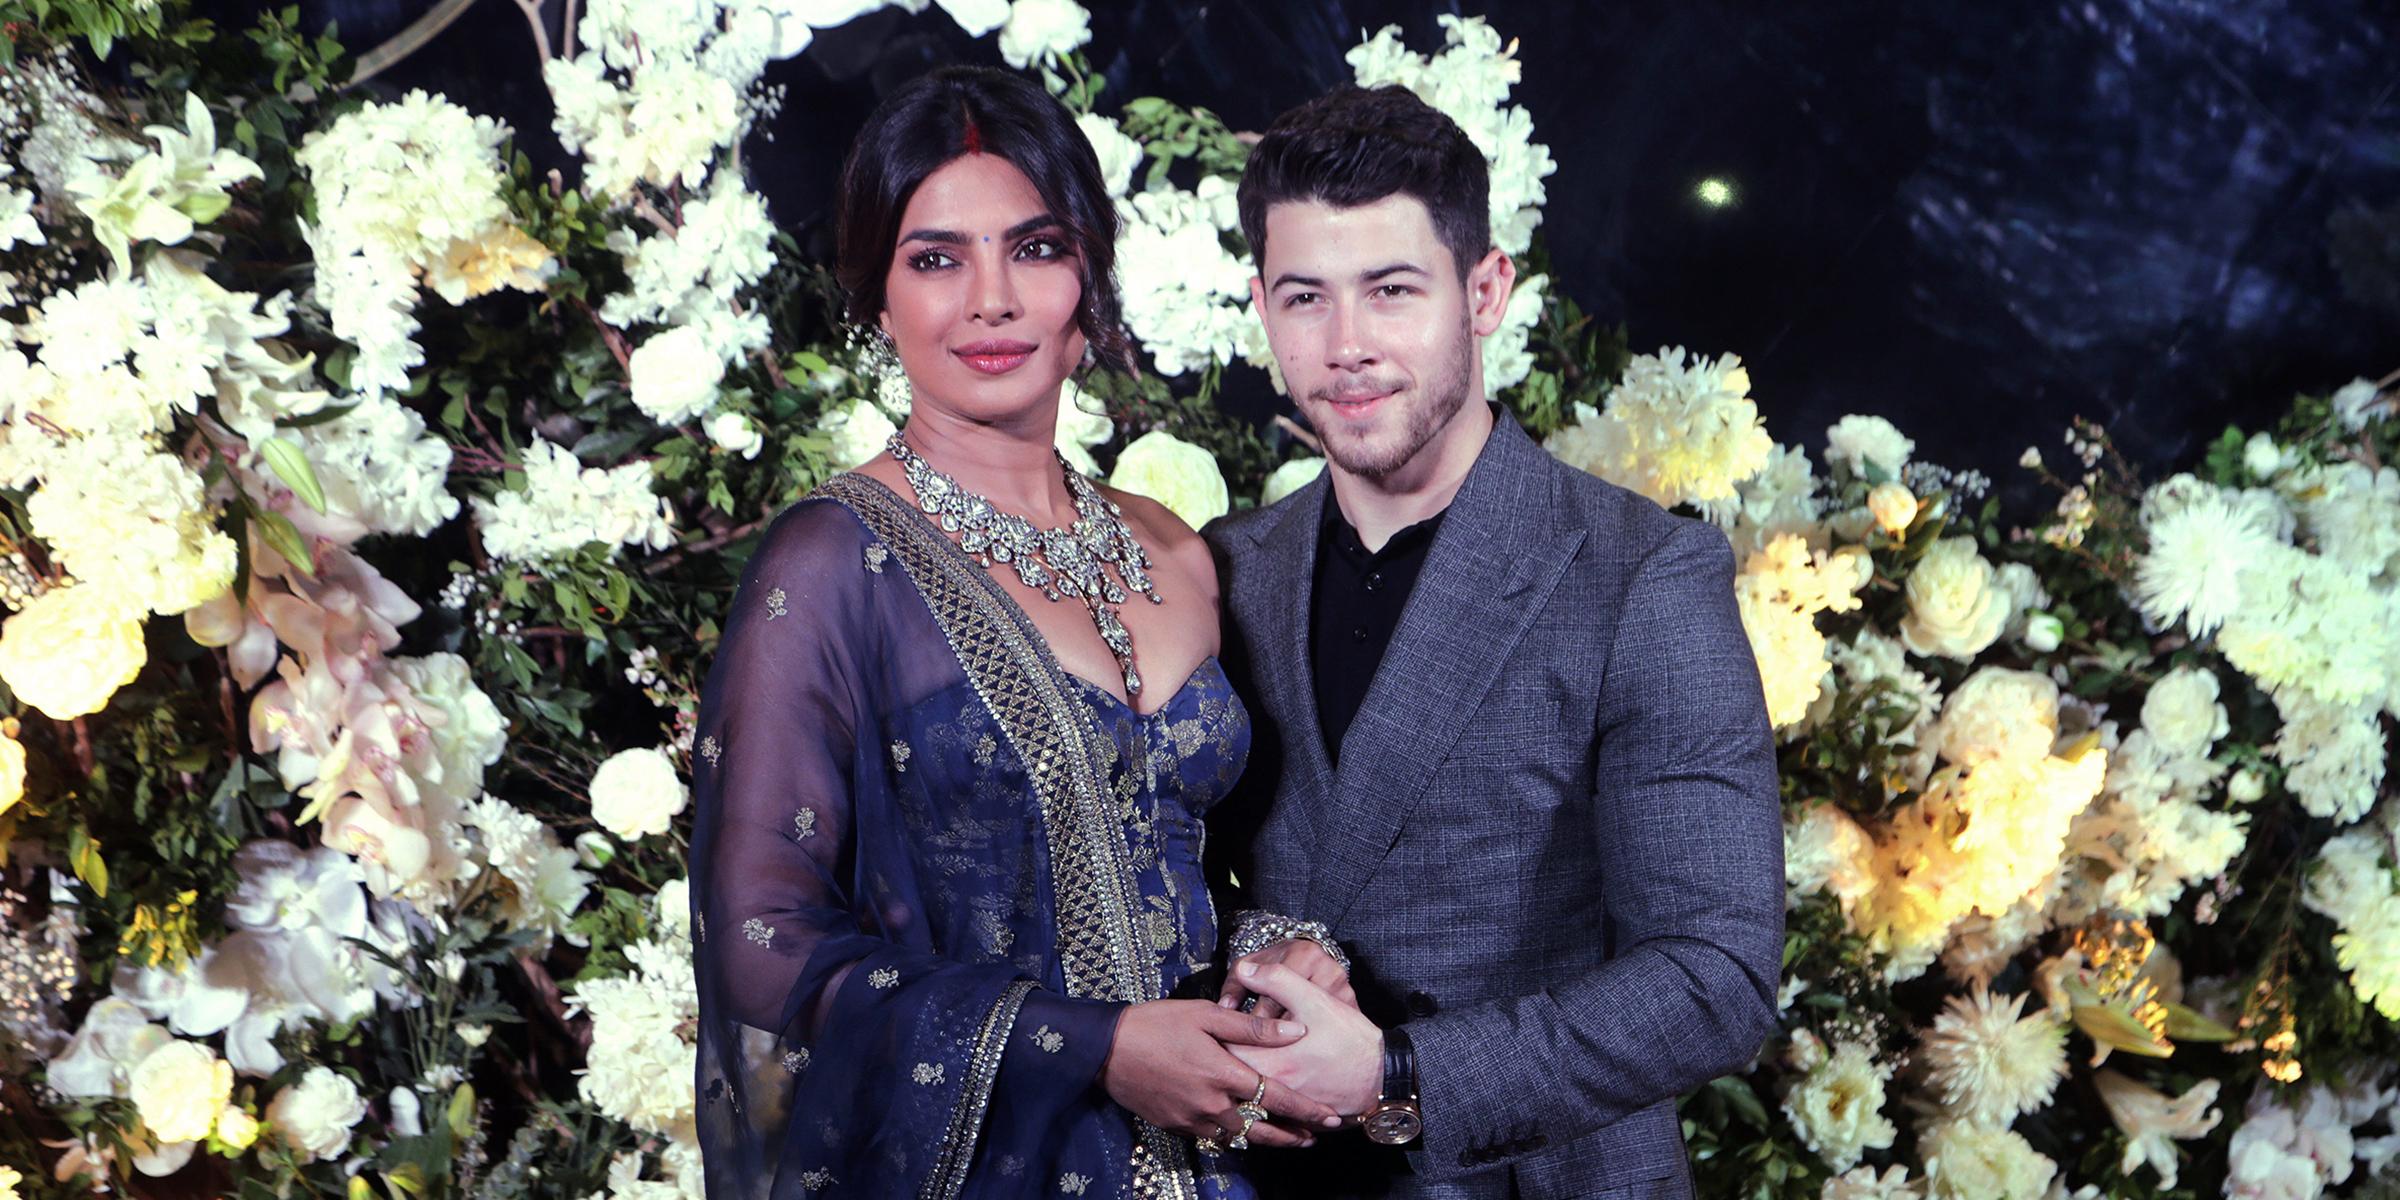 Priyanka Chopra and Nick Jonas just had another beautiful wedding reception